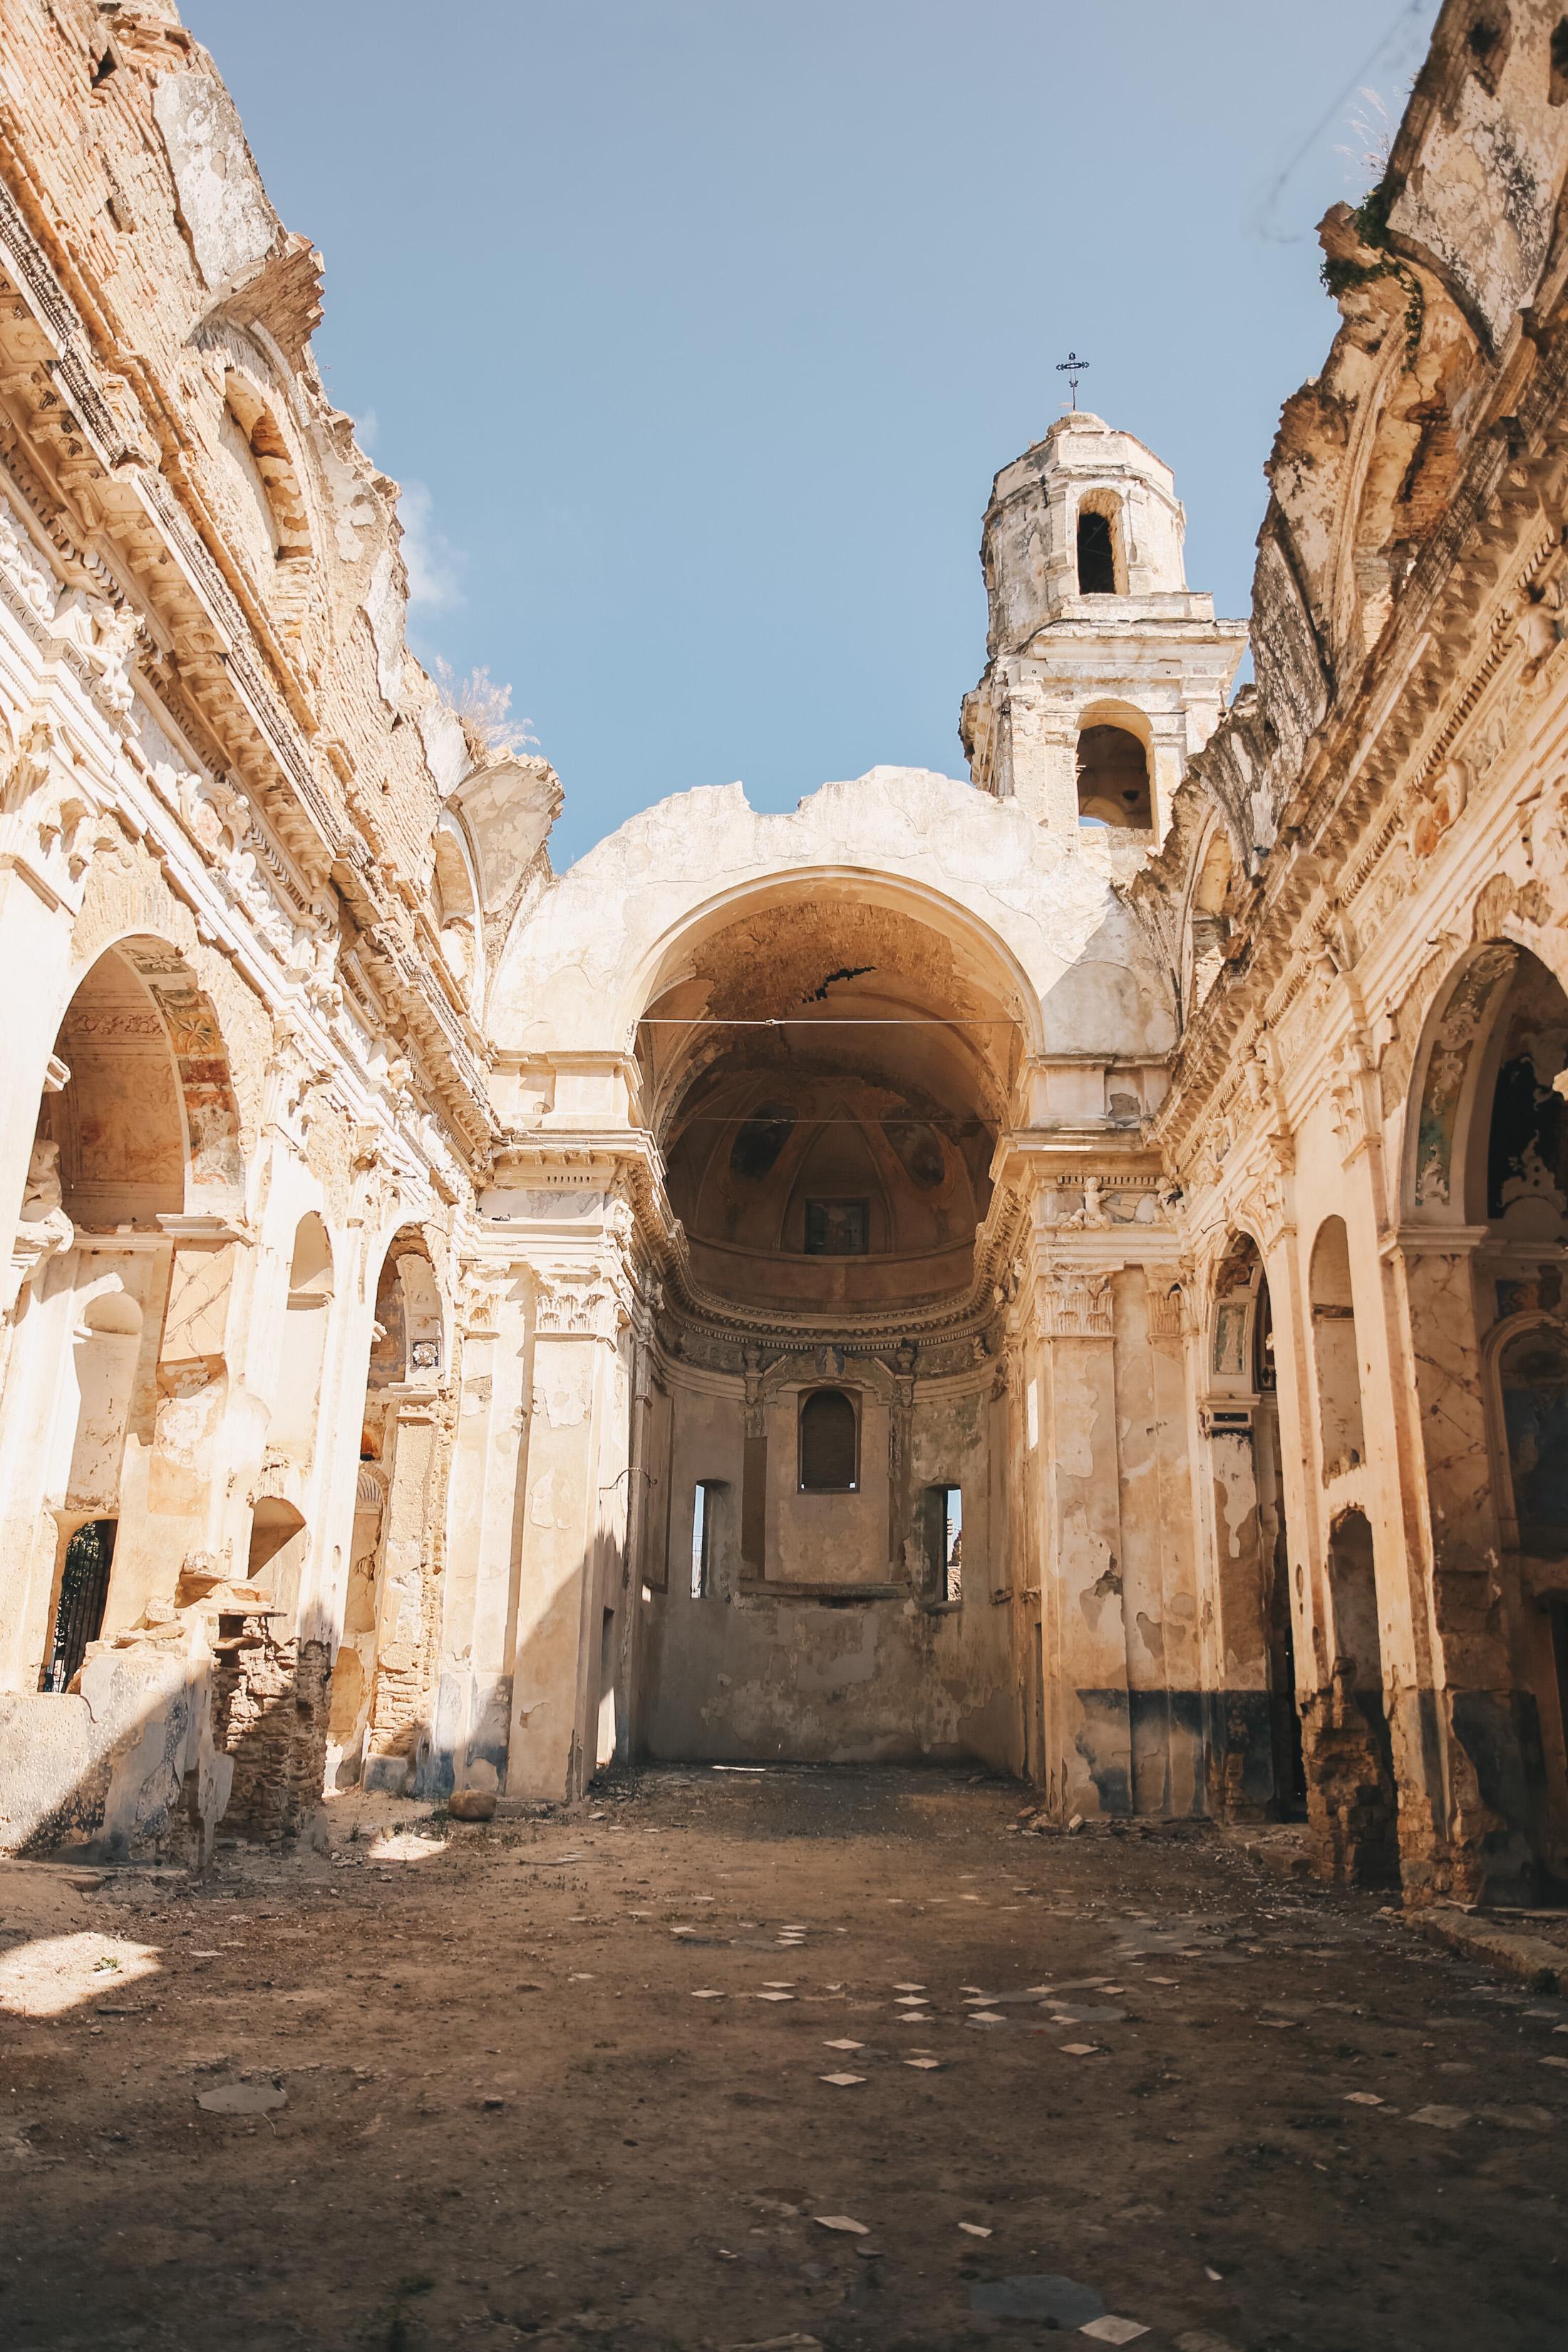 liguria-travel-guide-bussana-vecchia